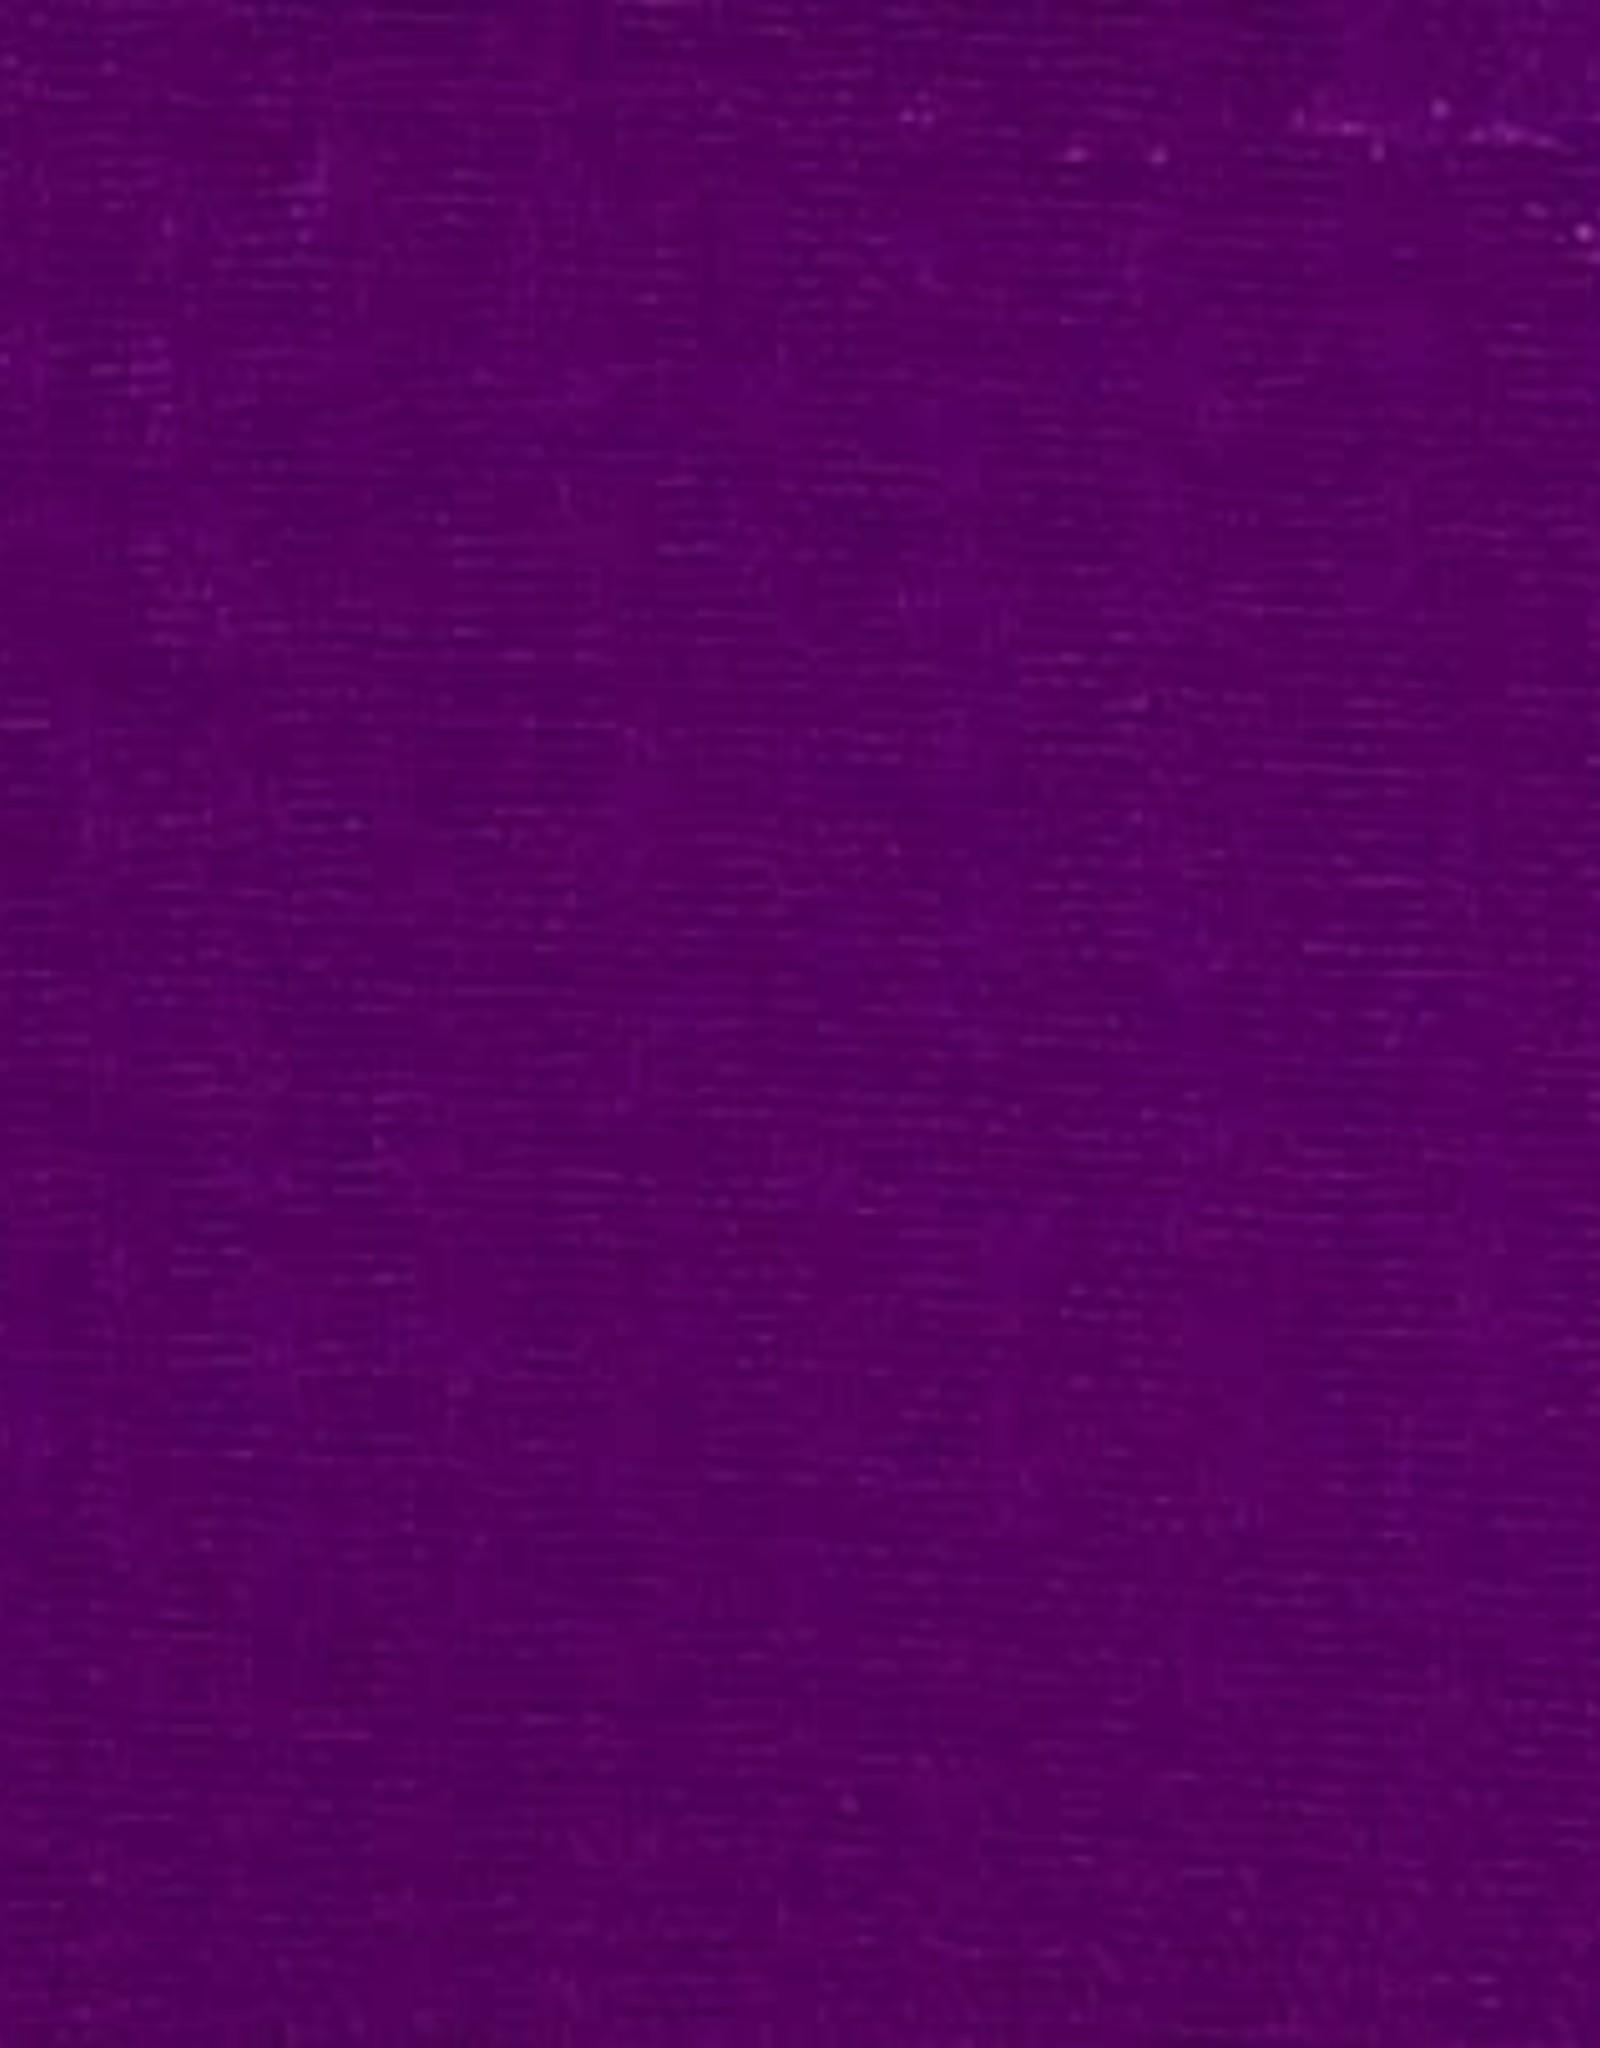 Chiffon 58 - 60 Inches Purple (Yard)